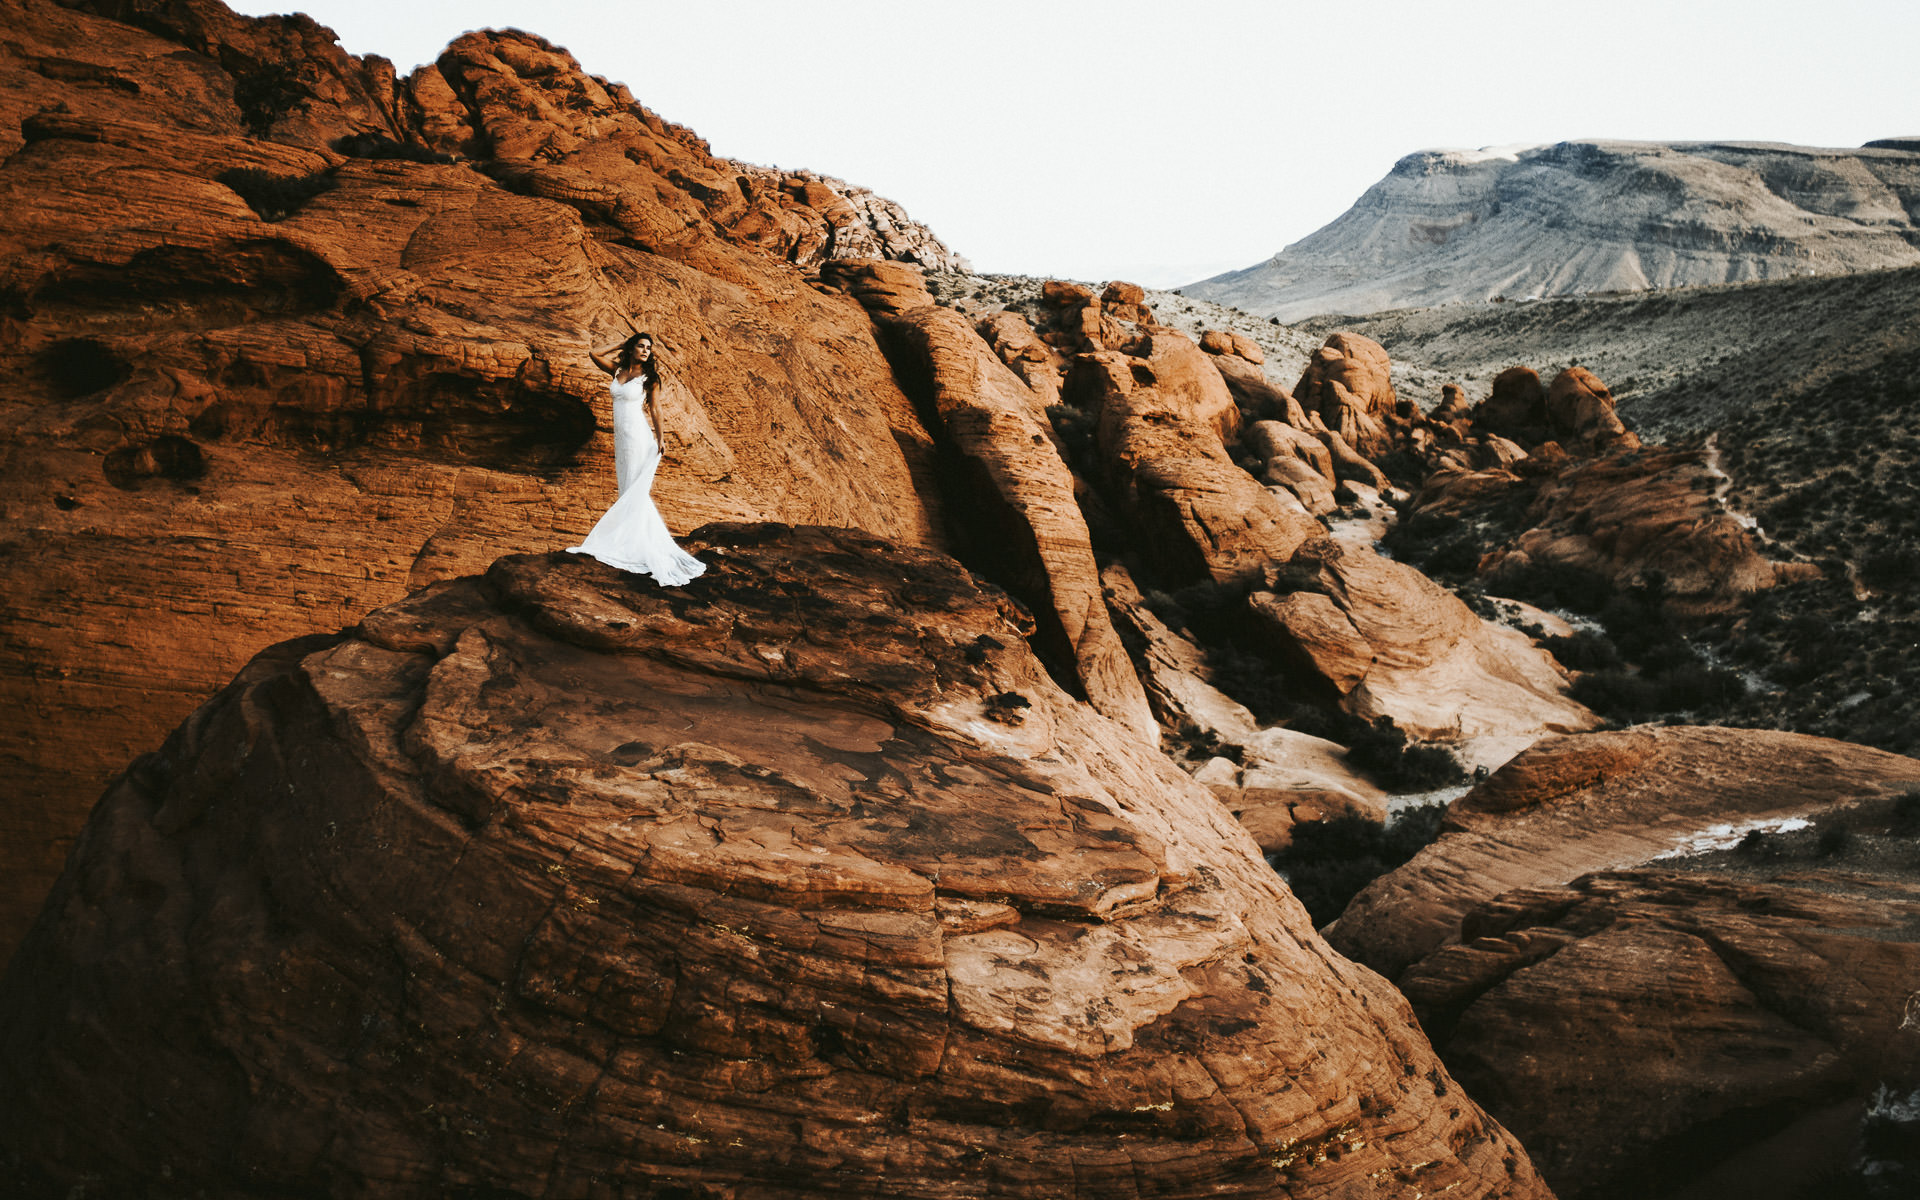 Twisted-Oaks-Studio-wppi-leica-red-rock-canyon-48.jpg